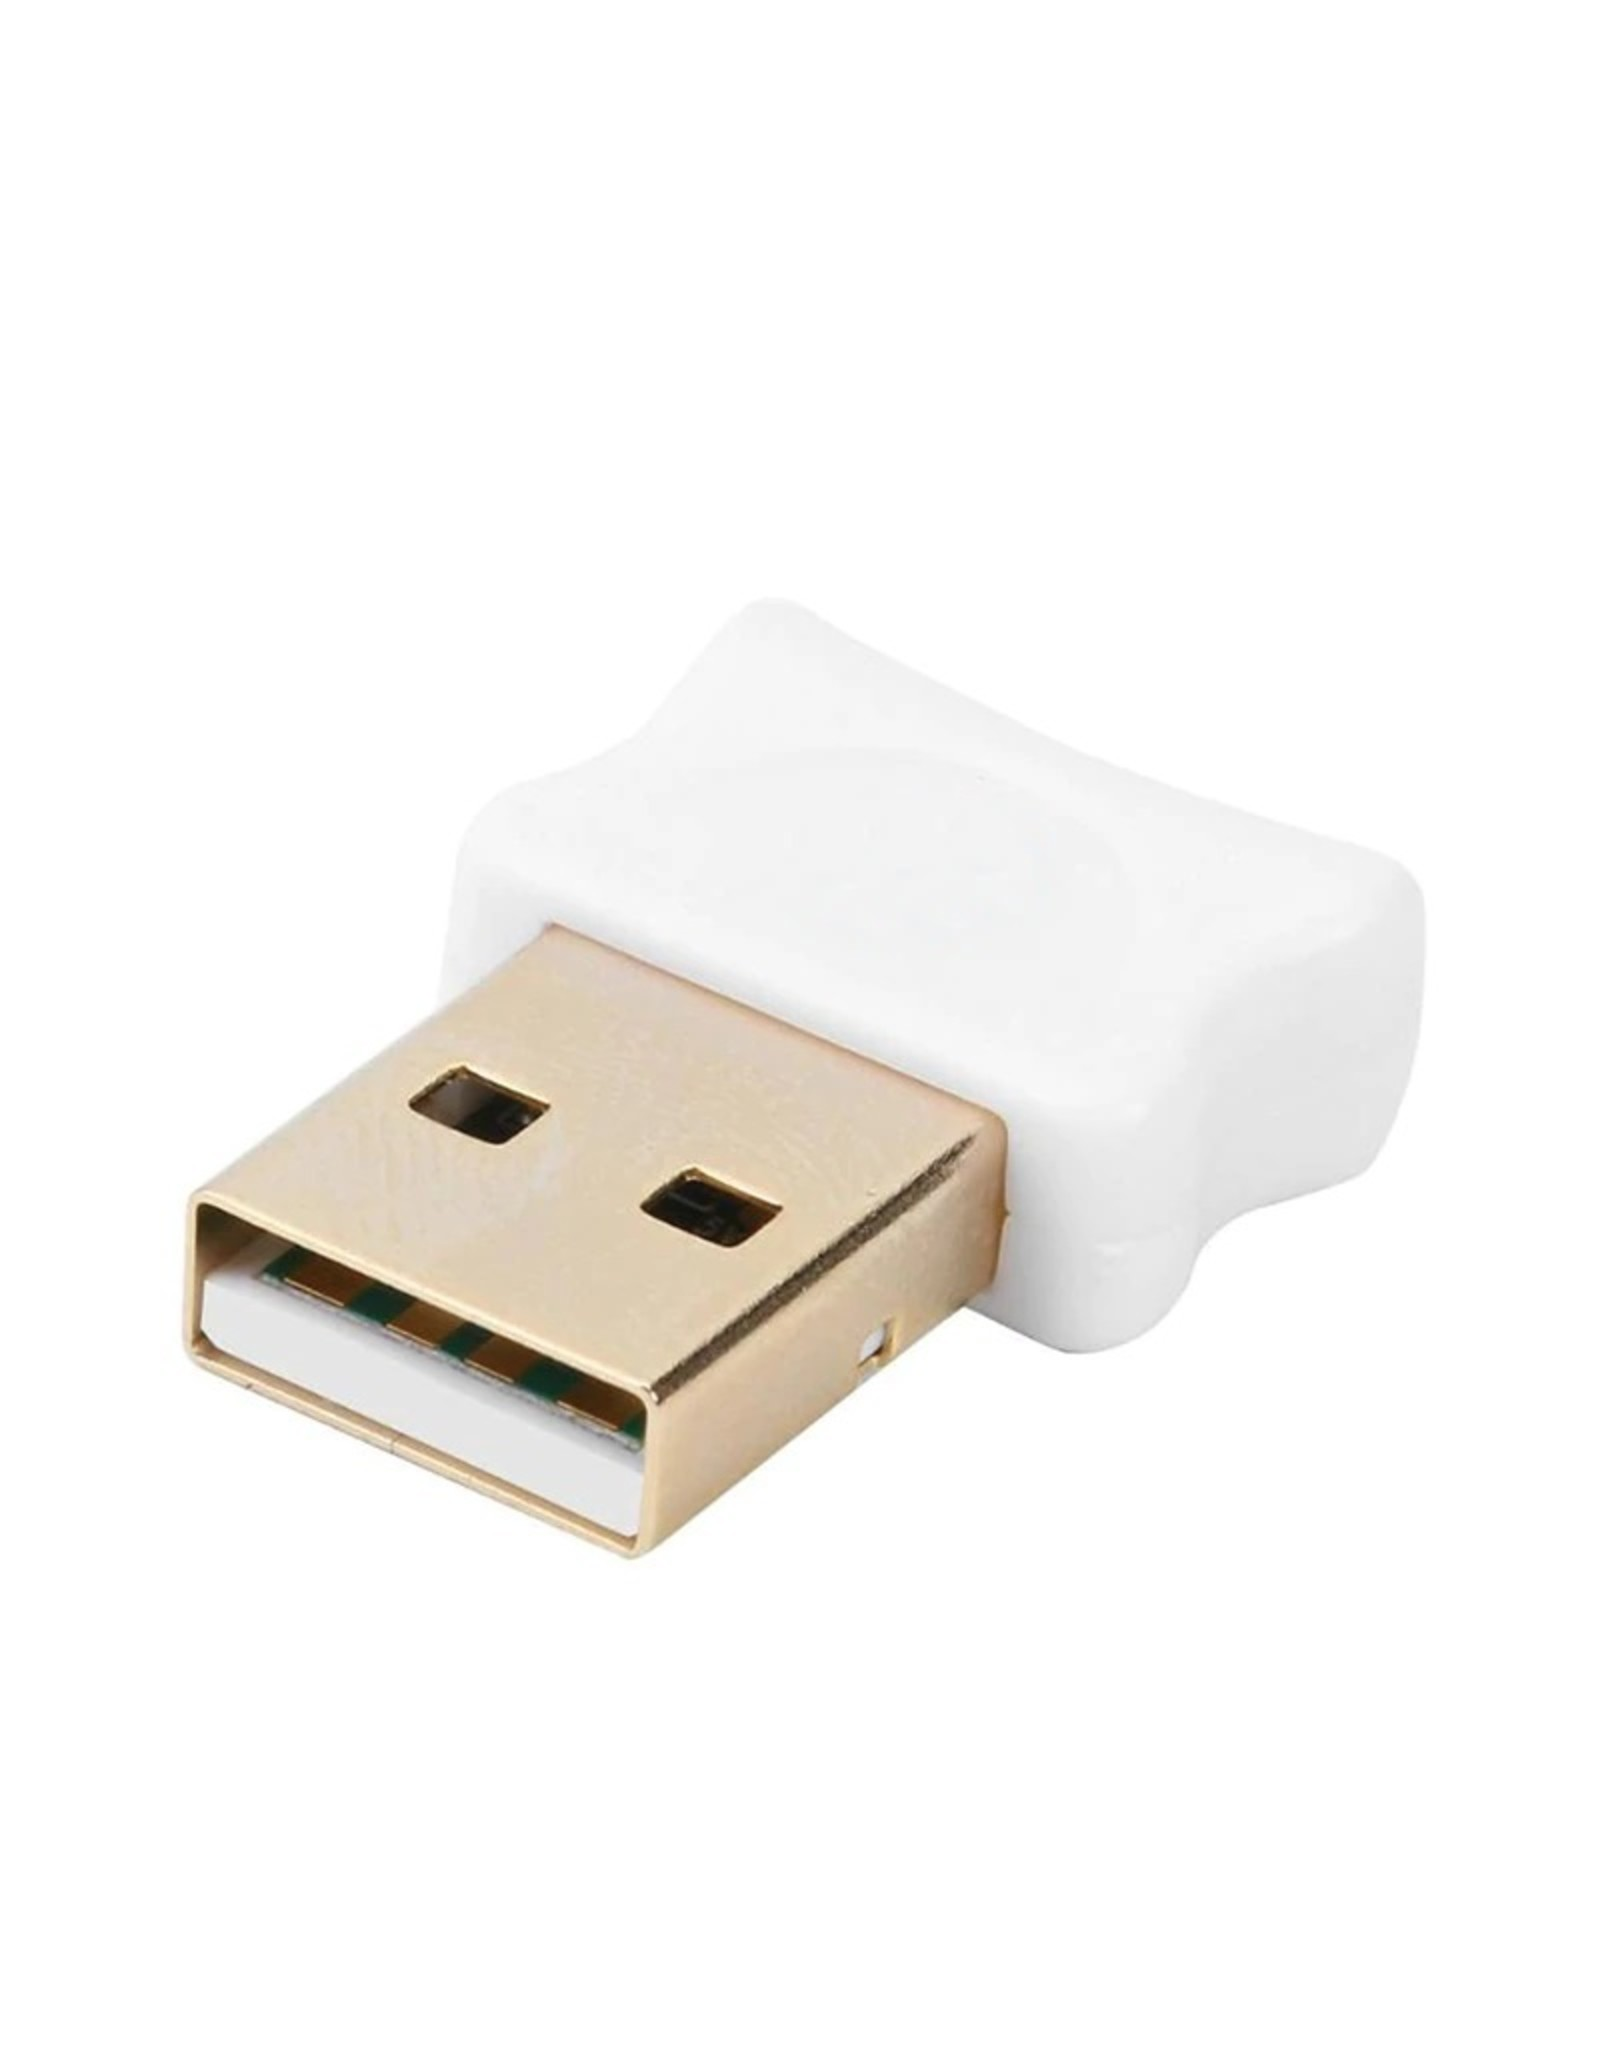 Bluetooth CSR 5.0 Dongle - Mini Bluetooth 5.0 USB Adapter – Dongle - Bluetooth adapter - draadloze dongle - verbind meerdere bluetooth apparaten – Kleur: Wit